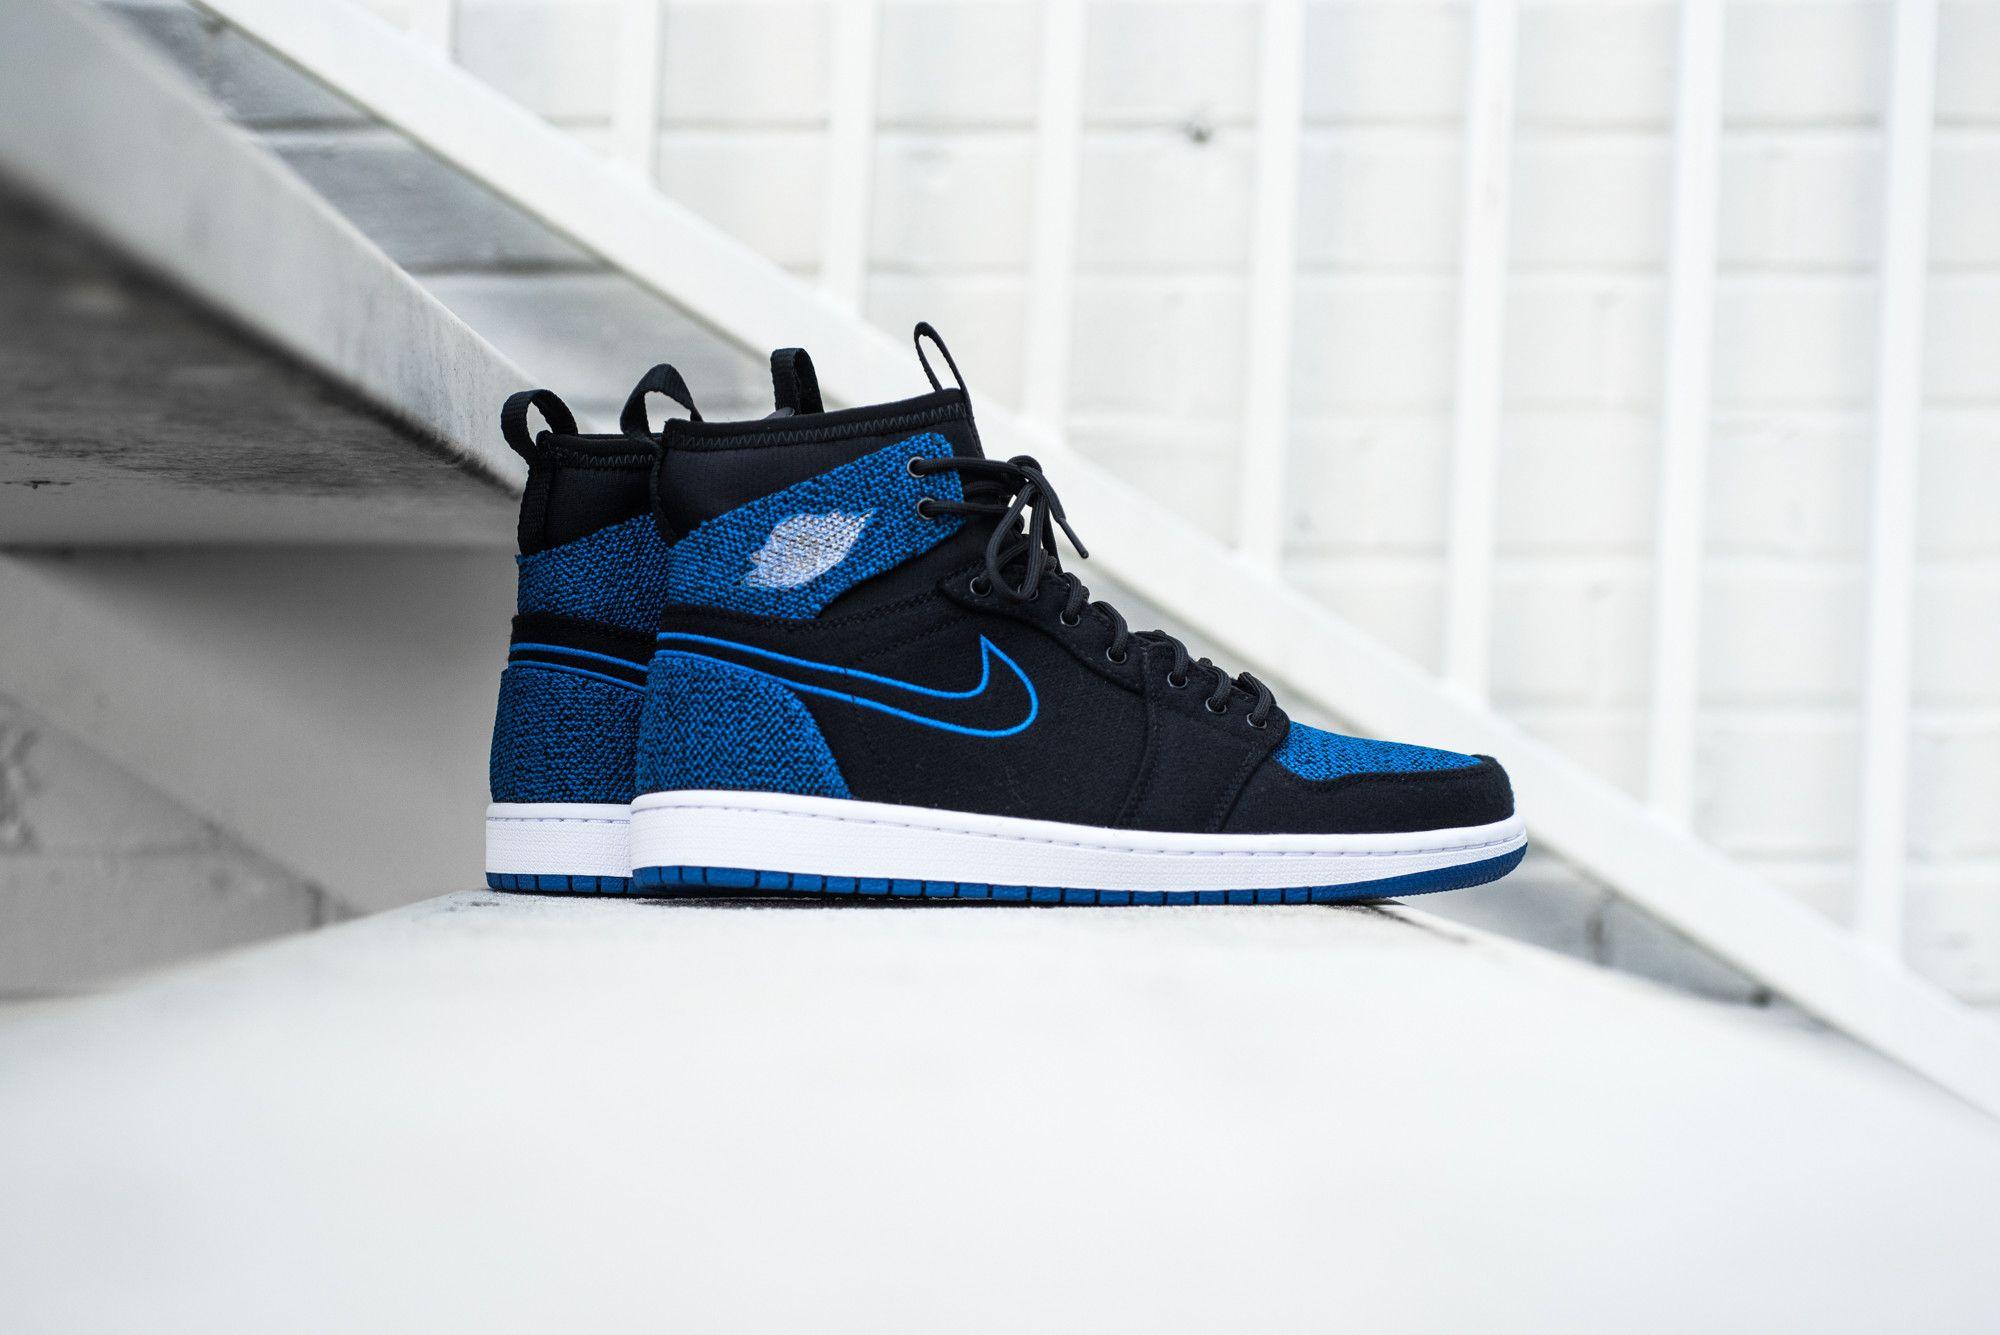 b8cc0f9fdb8a Air Jordan 1 Retro Ultra High - Black Royal from Sneaker Politics ...